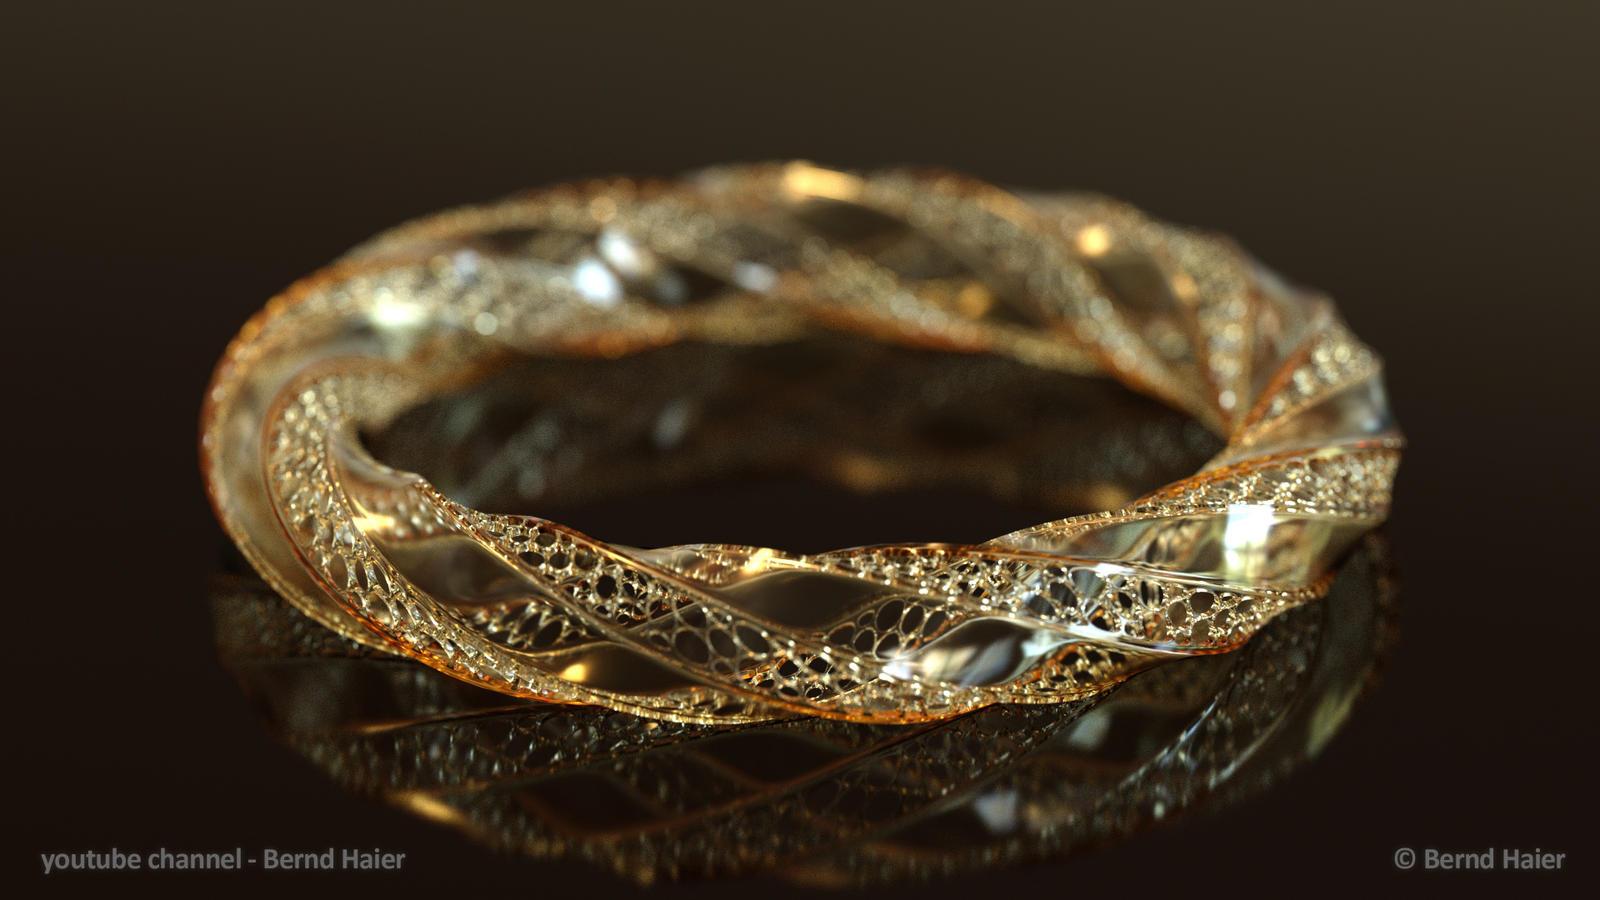 jewelry design part 11 bracelet part 4b Iray mat1 by Bernd ...